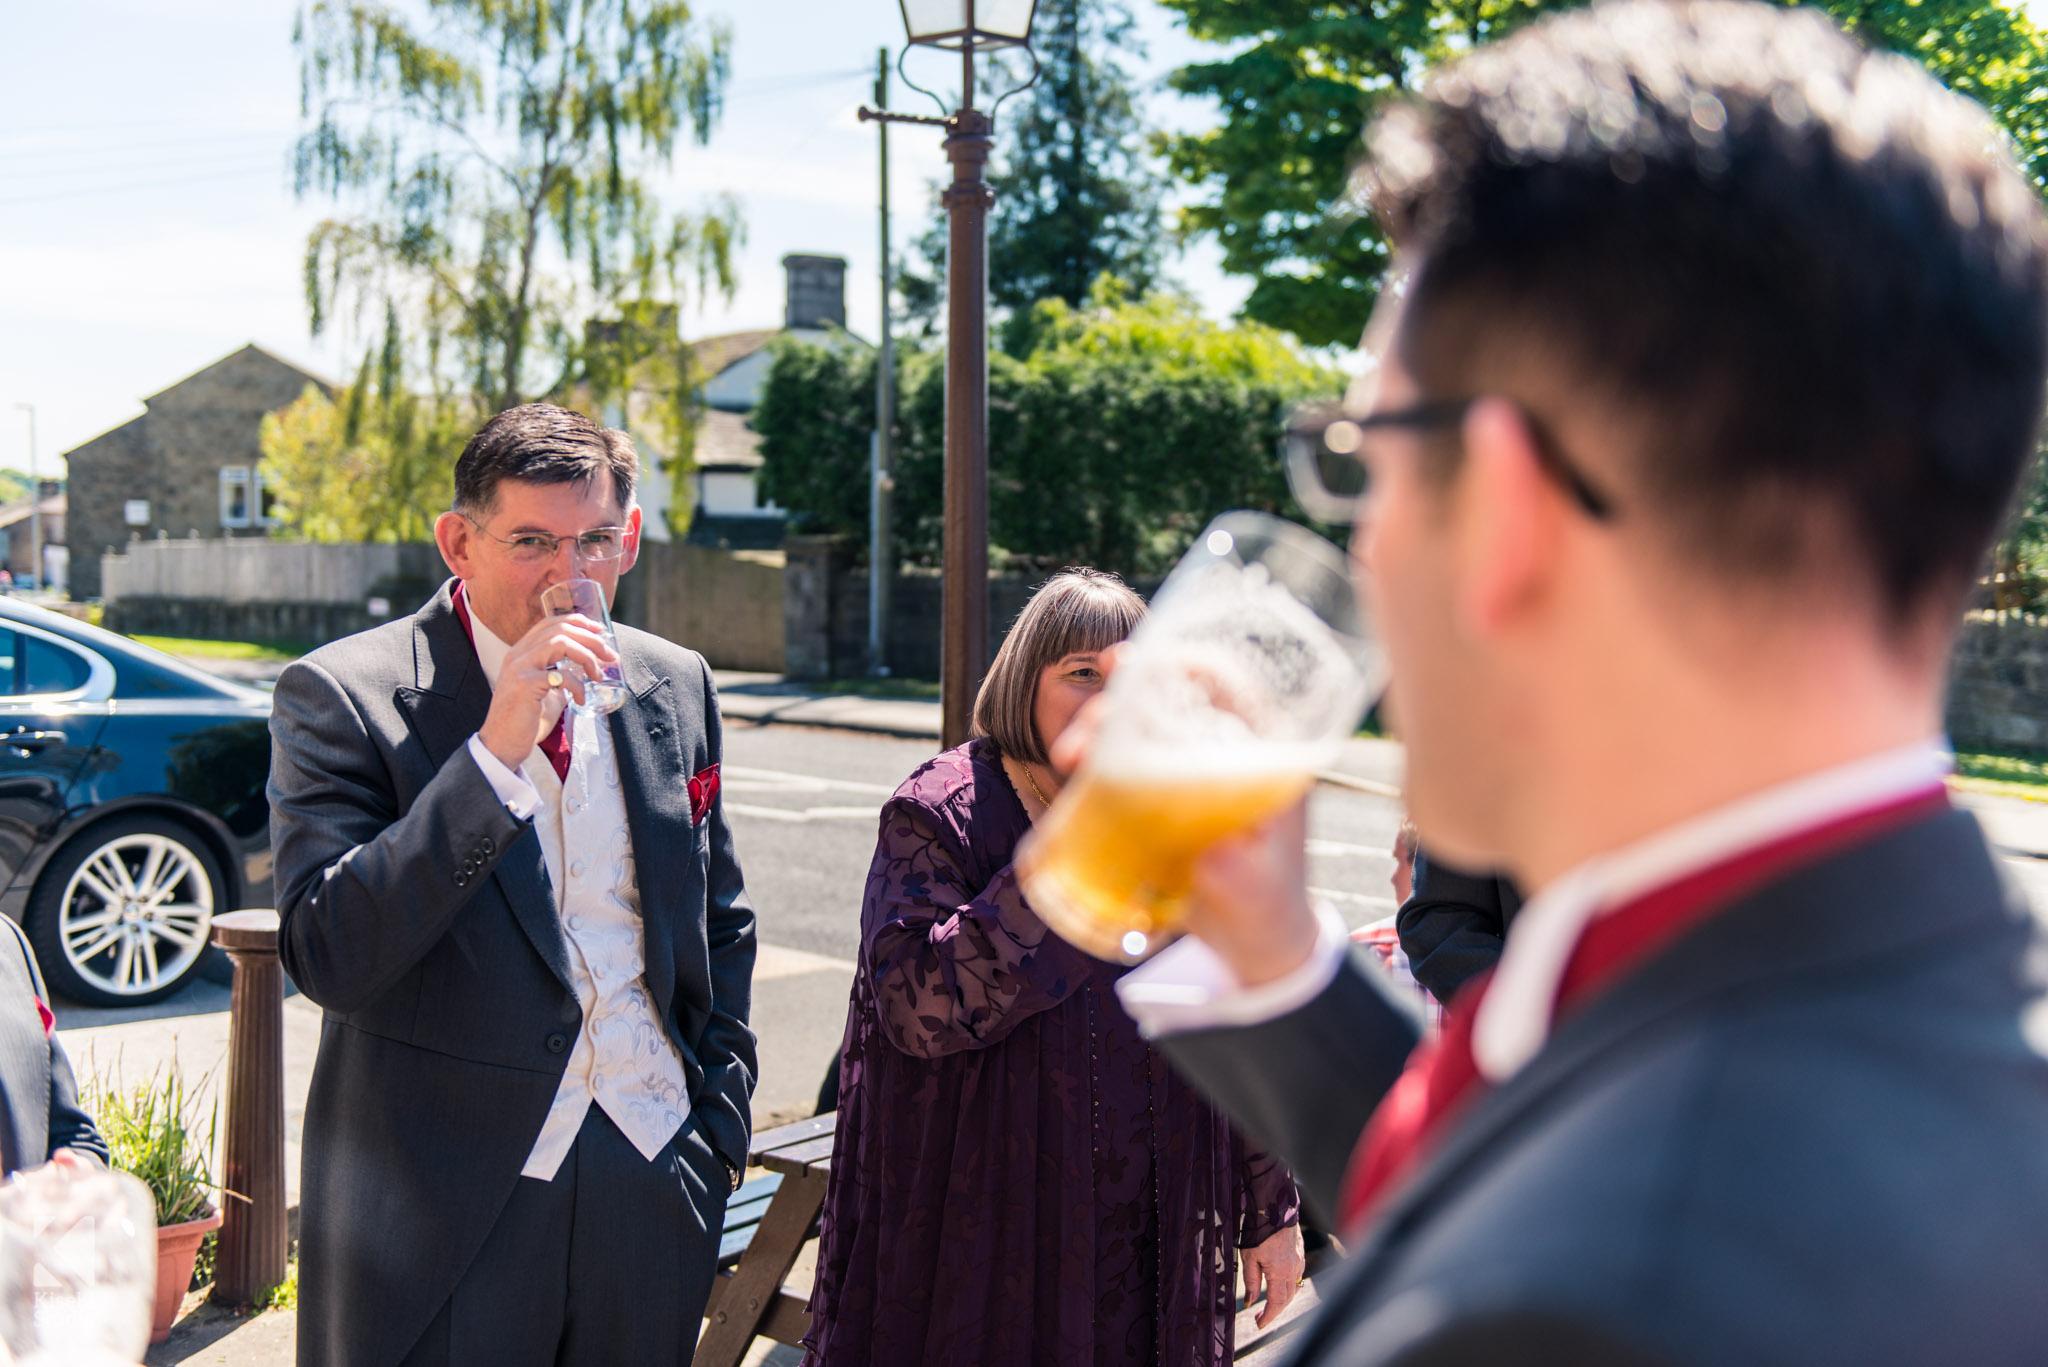 Pre-wedding drinks with the groomsmen